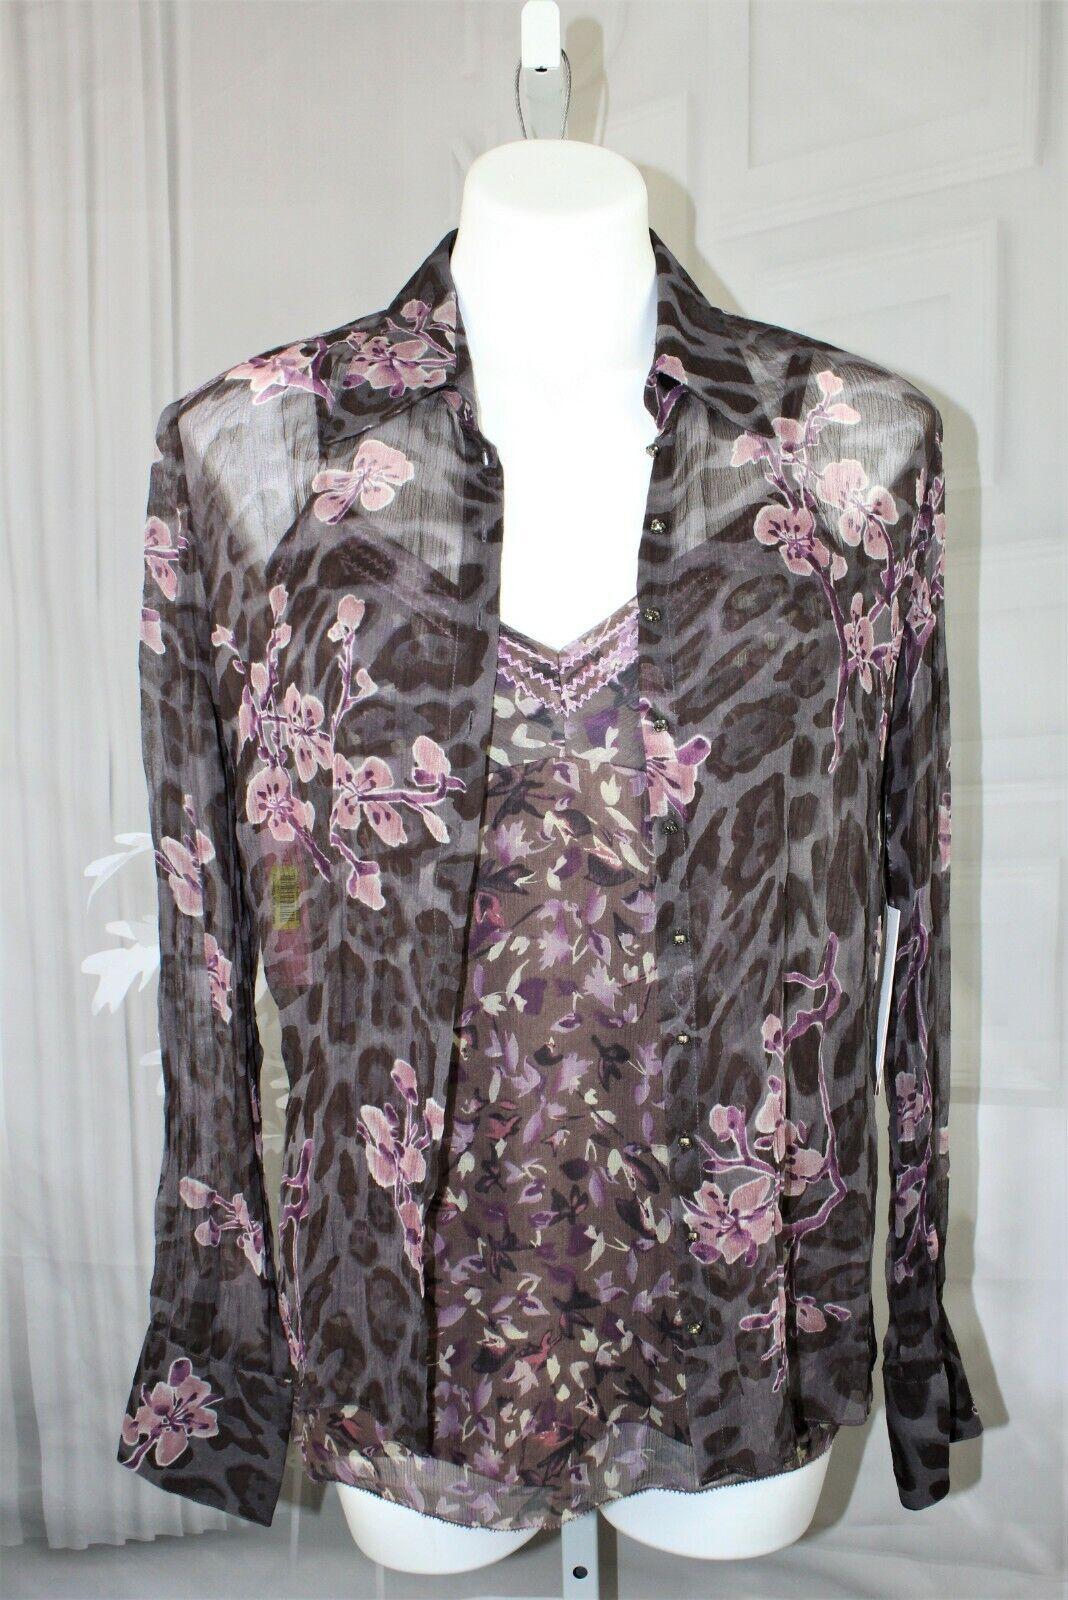 damen NEW  Gianni Bini Silk 2 pc blouse & cami tank top set Größe Medium M